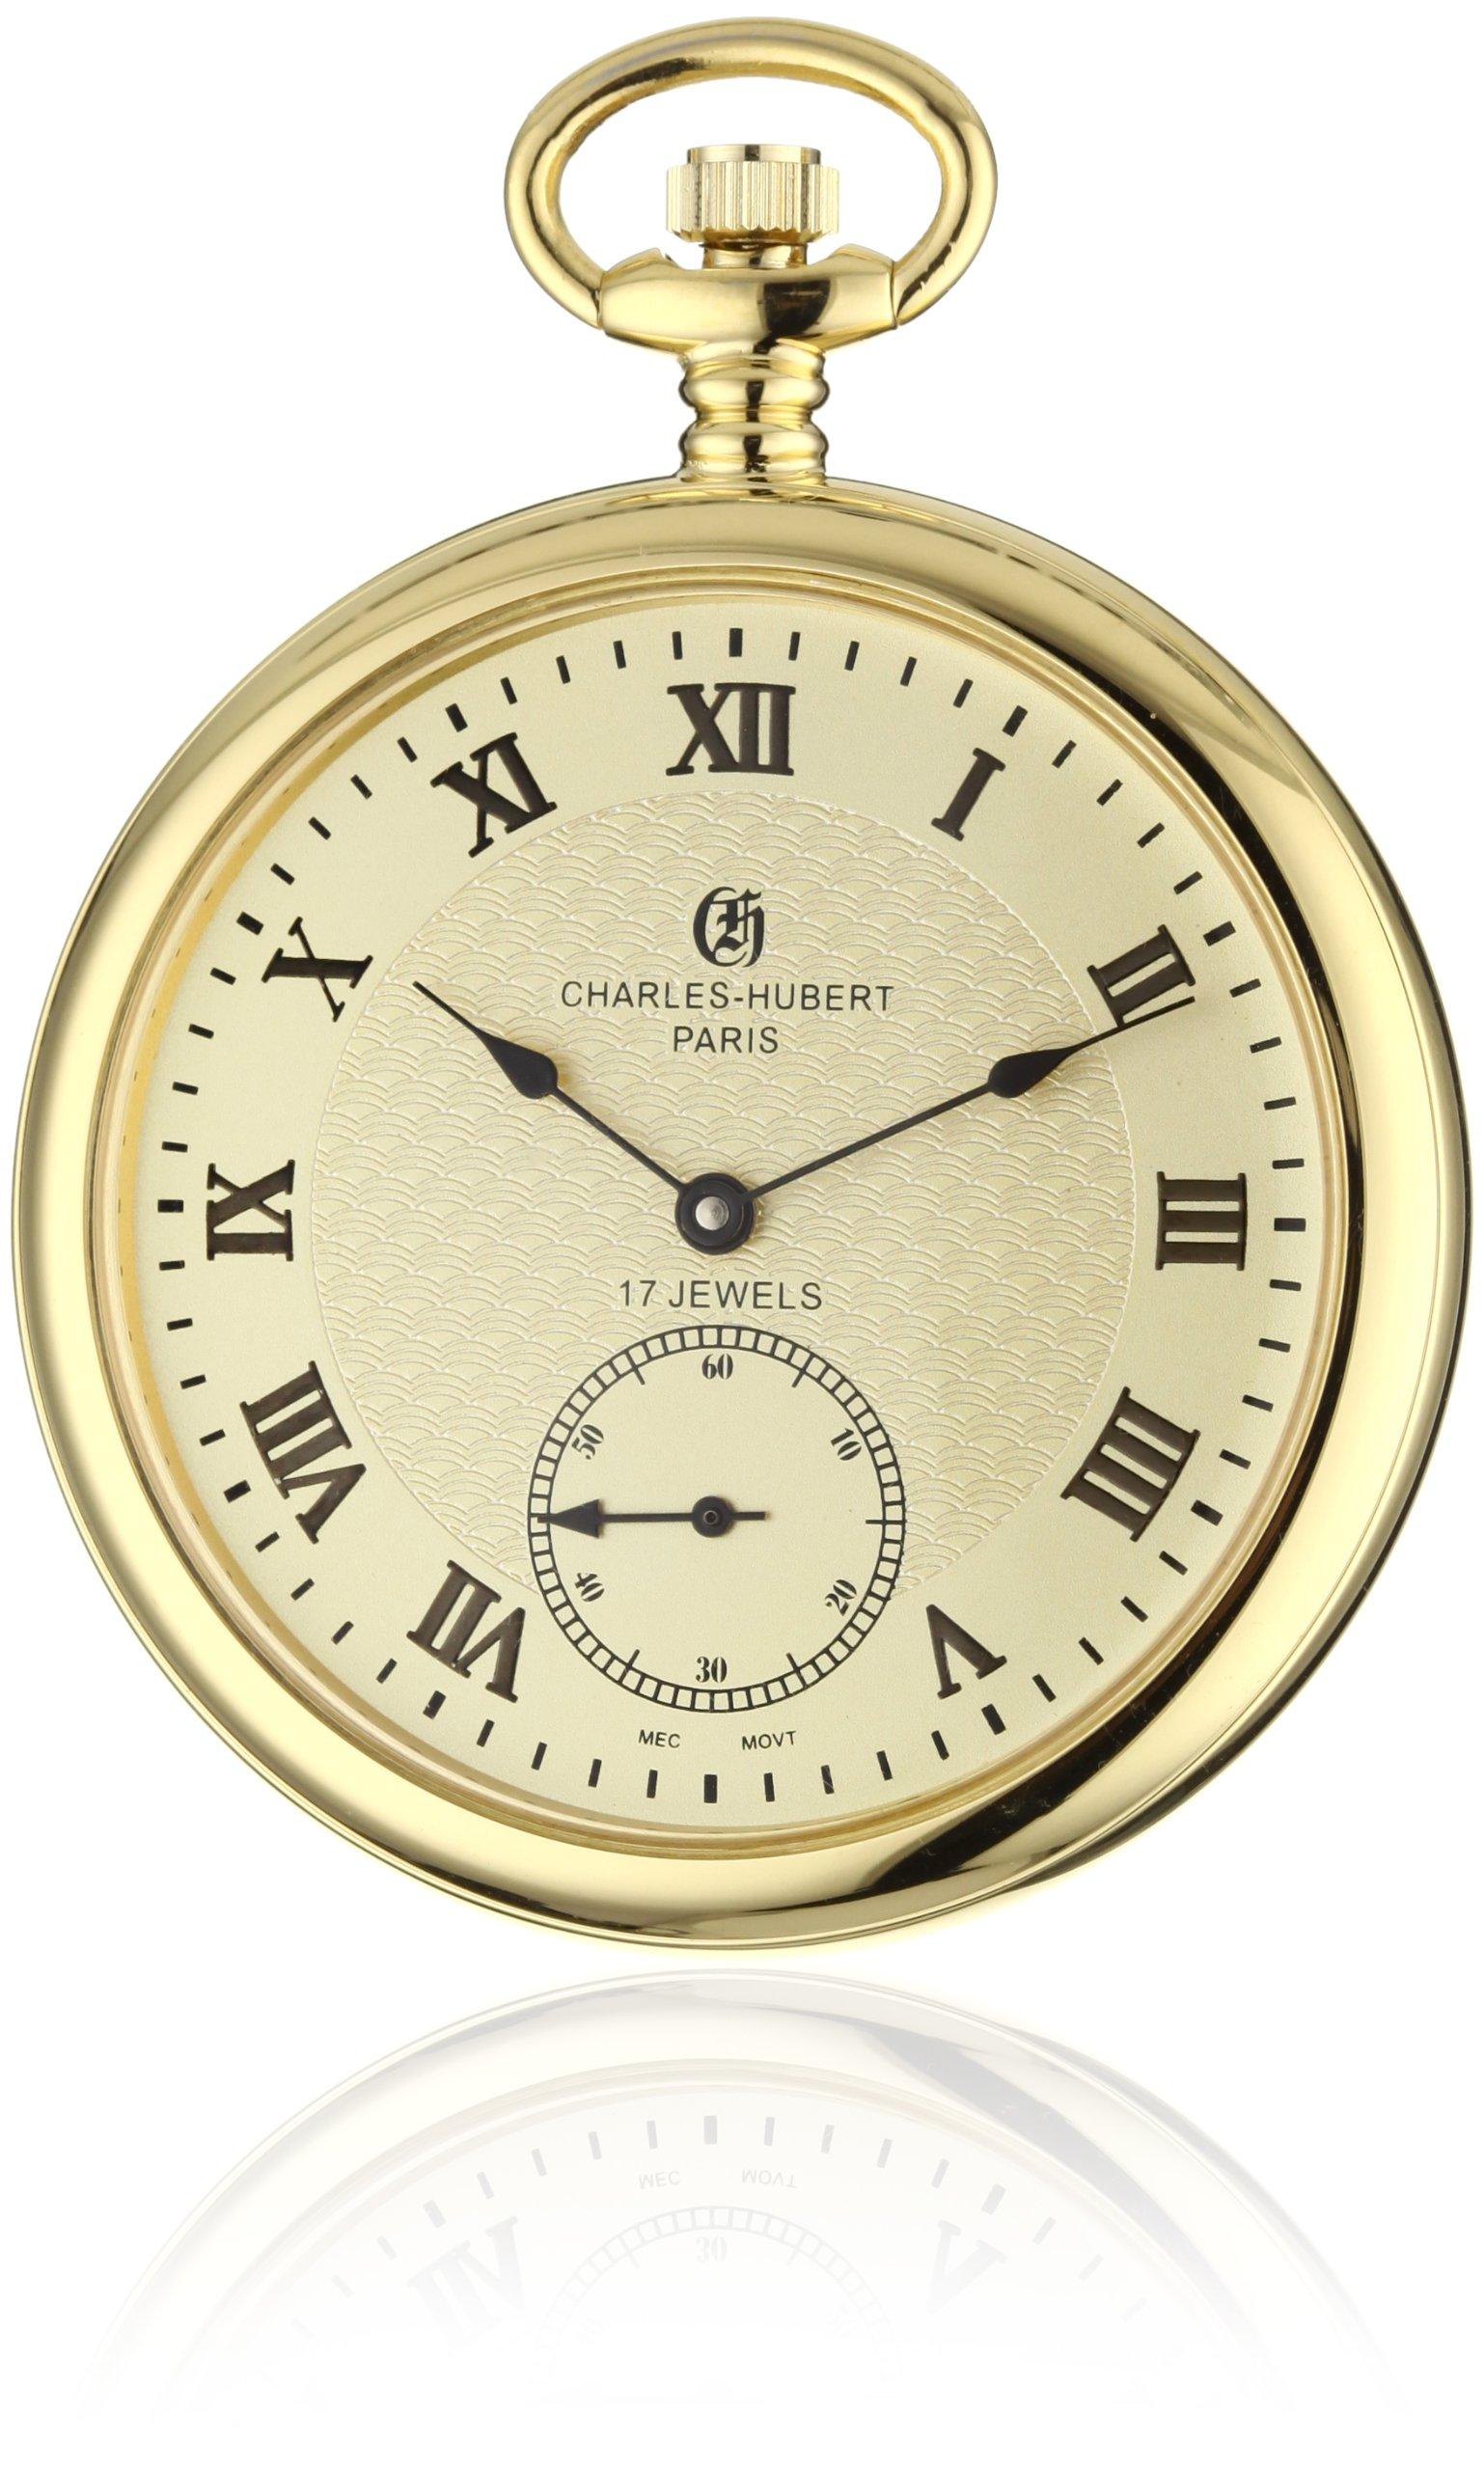 Charles-Hubert, Paris 3912-G Premium Collection Stainless Steel Pocket Watch by Charles-Hubert, Paris